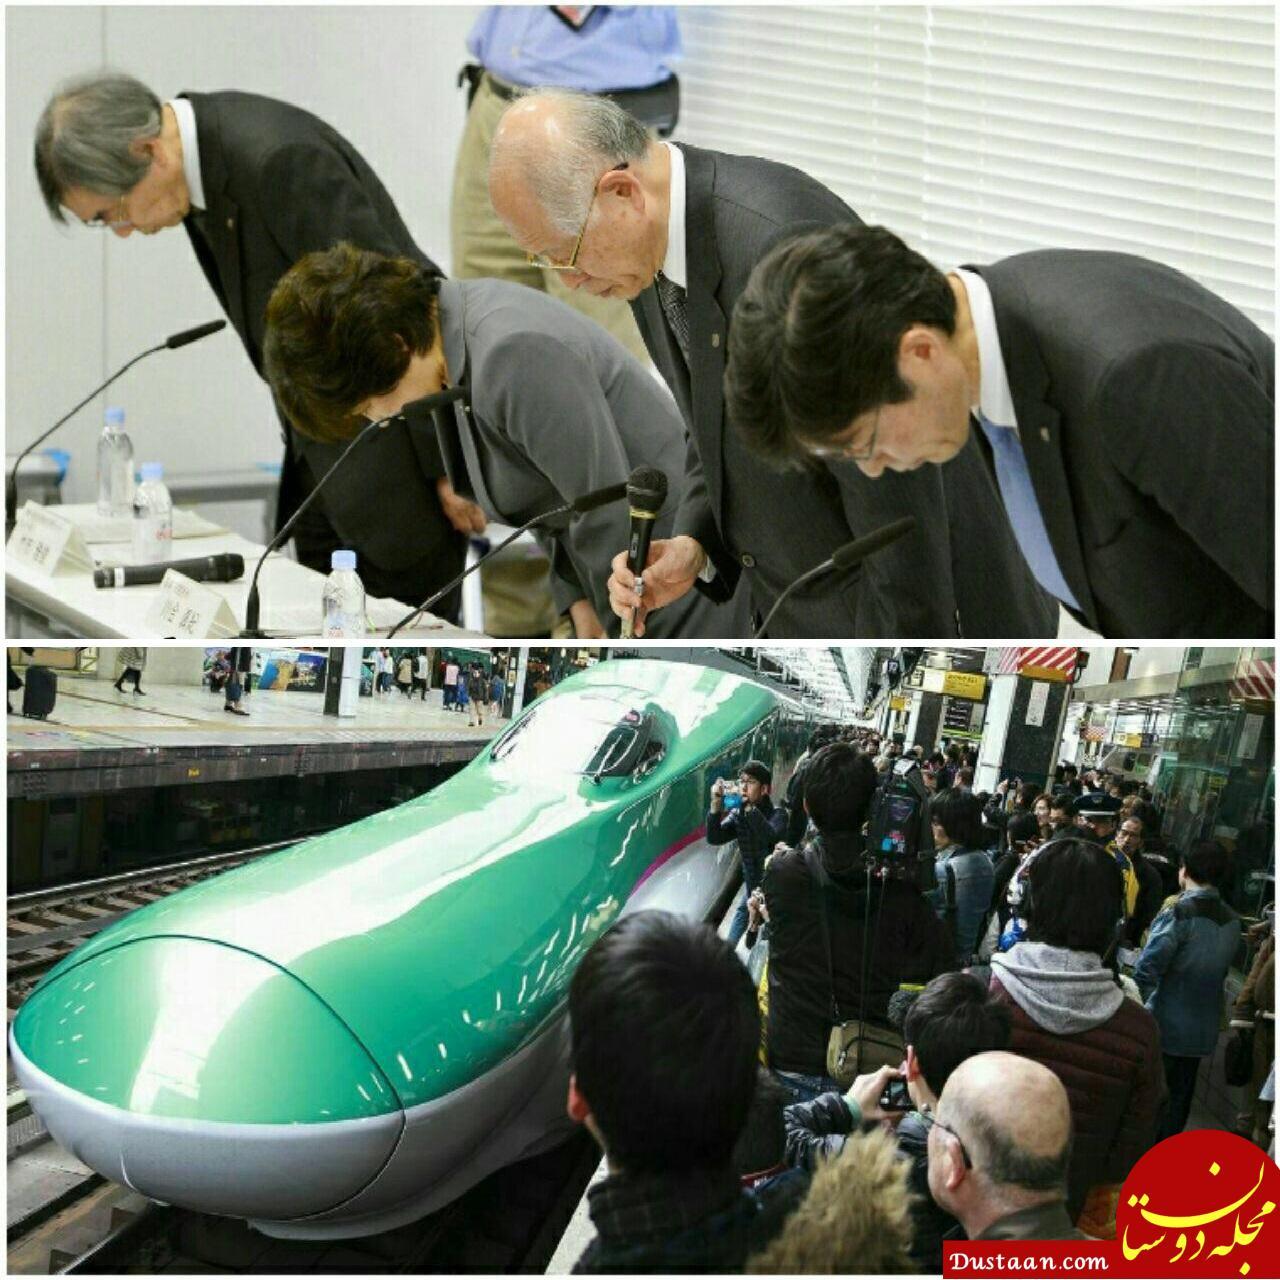 www.dustaan.com عذرخواهی ژاپنی ها به خاطر 20 ثانیه شتاب! +عکس